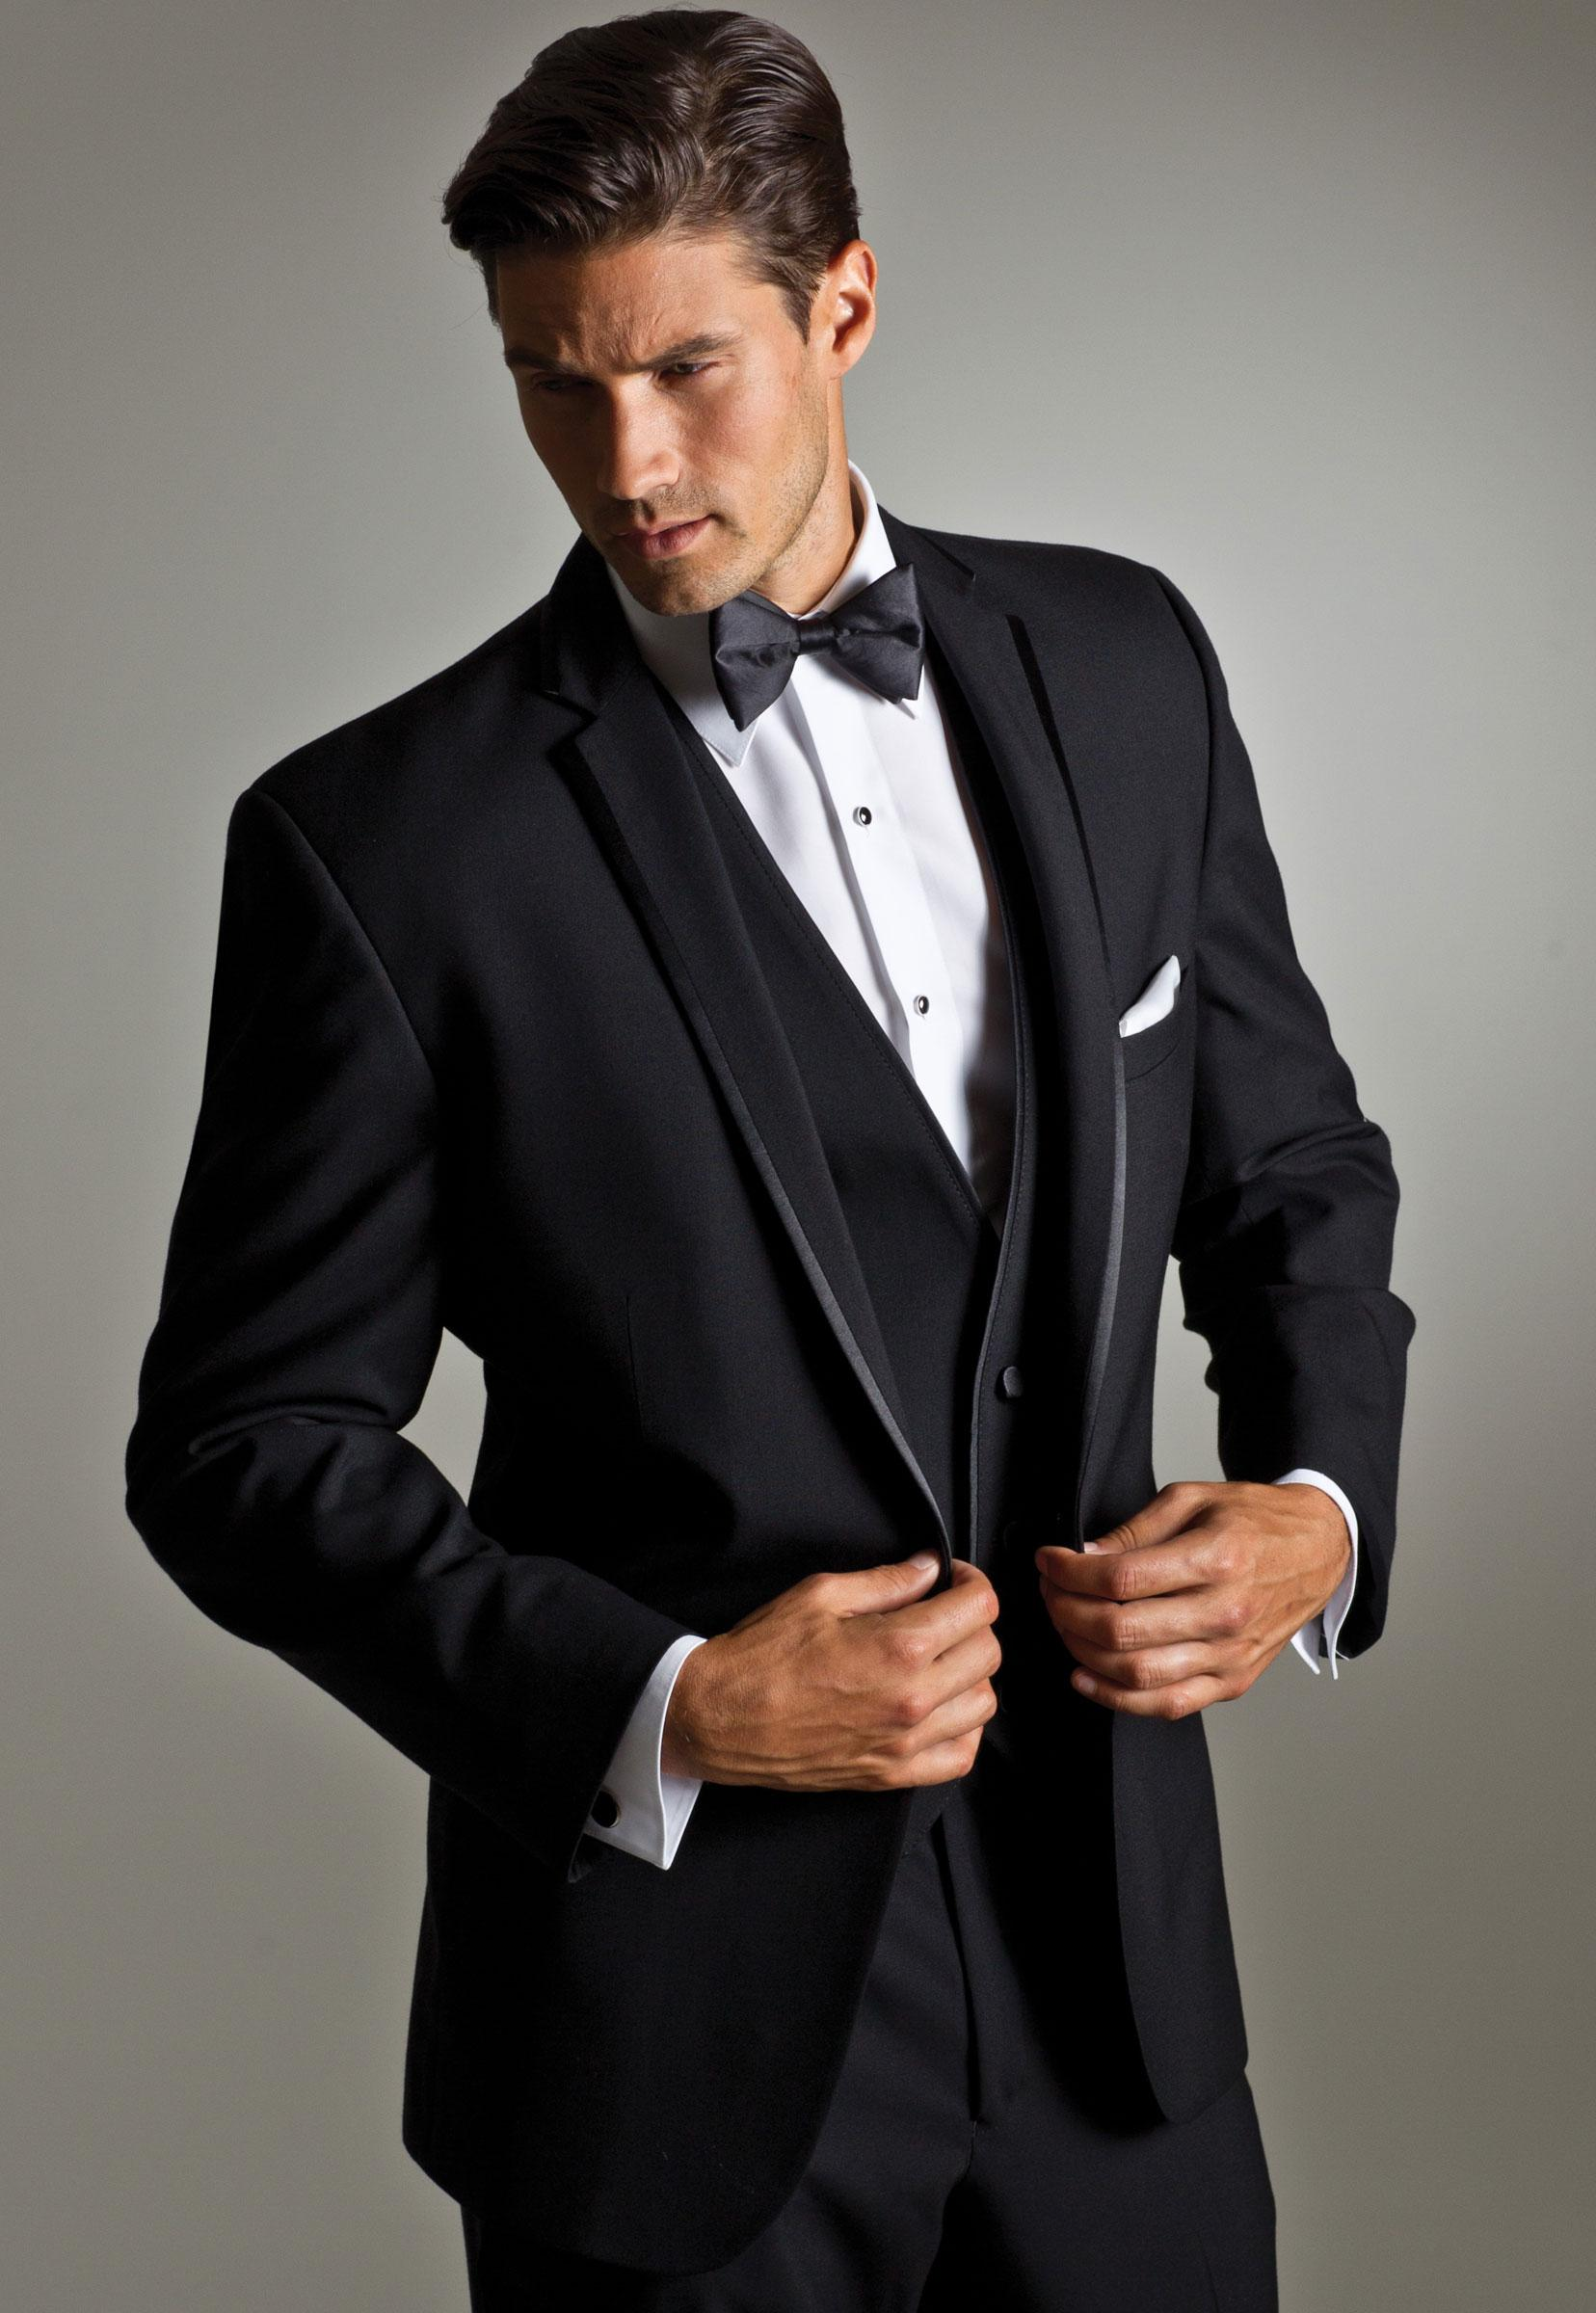 Notched Lapel Best Mens Suits Black Wedding For Men Tuxedos One Button Groomsmen Three Piece Suit Jacket Pants Vest Tie S3012 All Prom